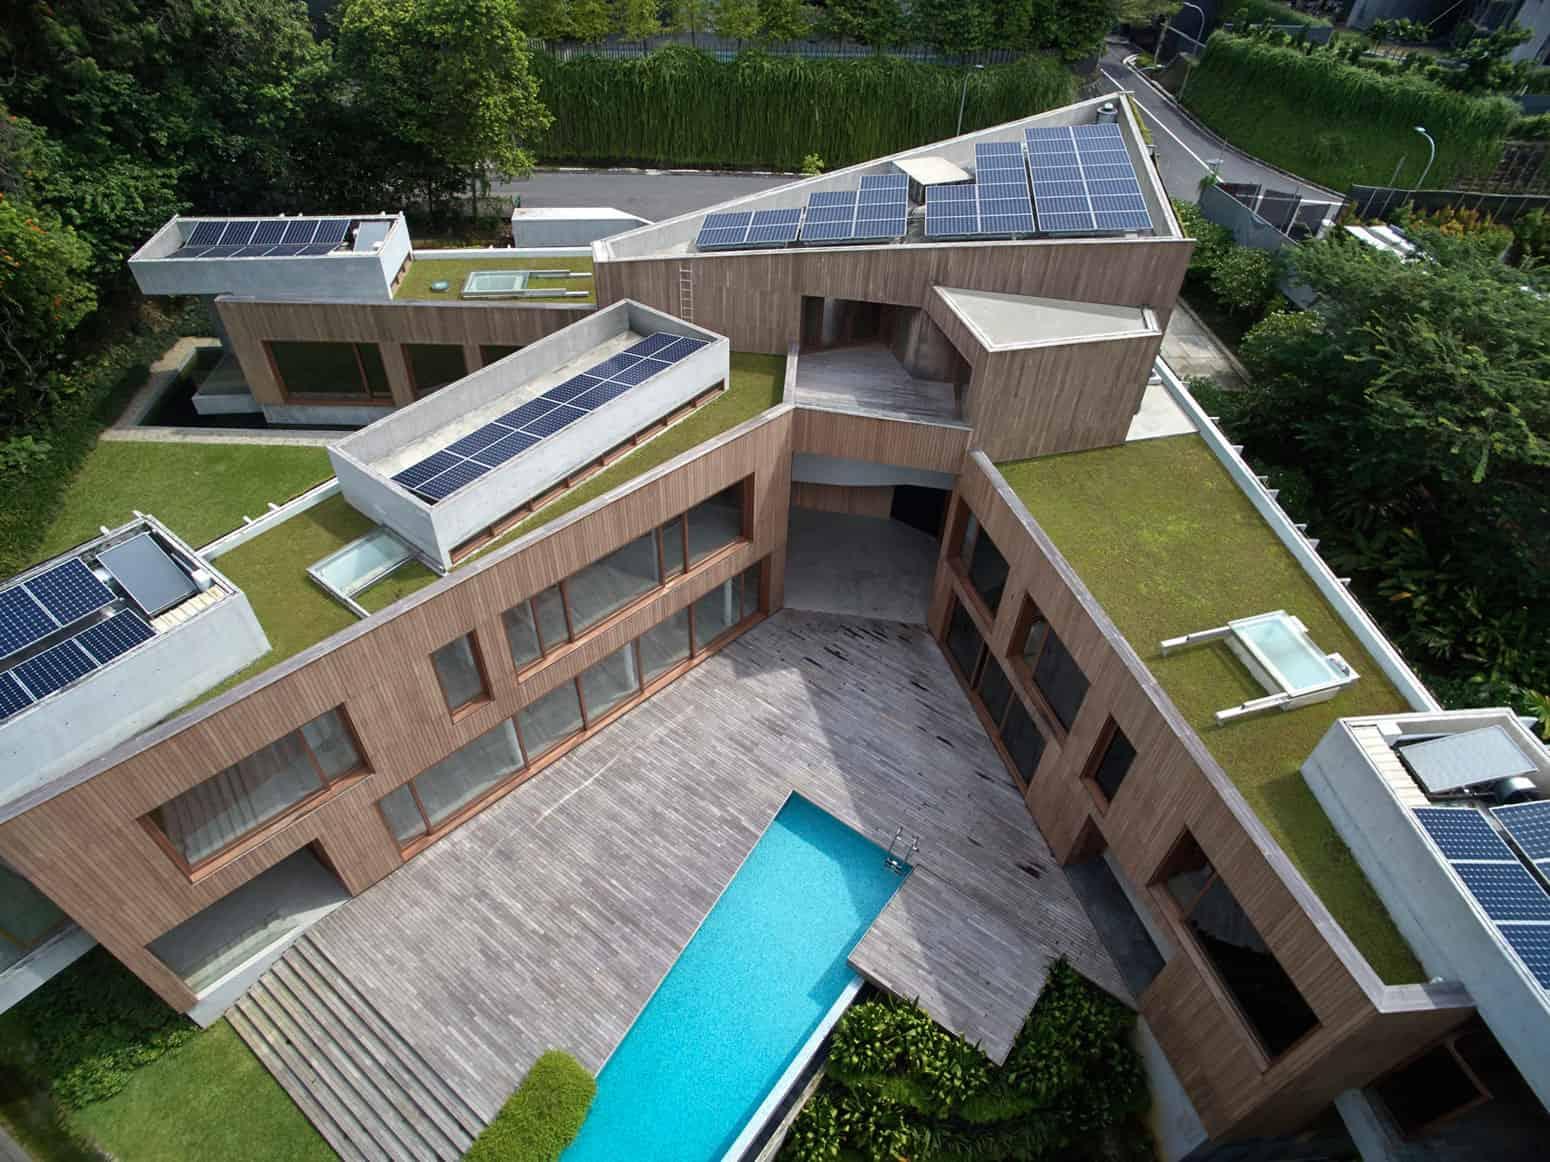 Tsao & McKown Architects Design a Green Home in Singapore